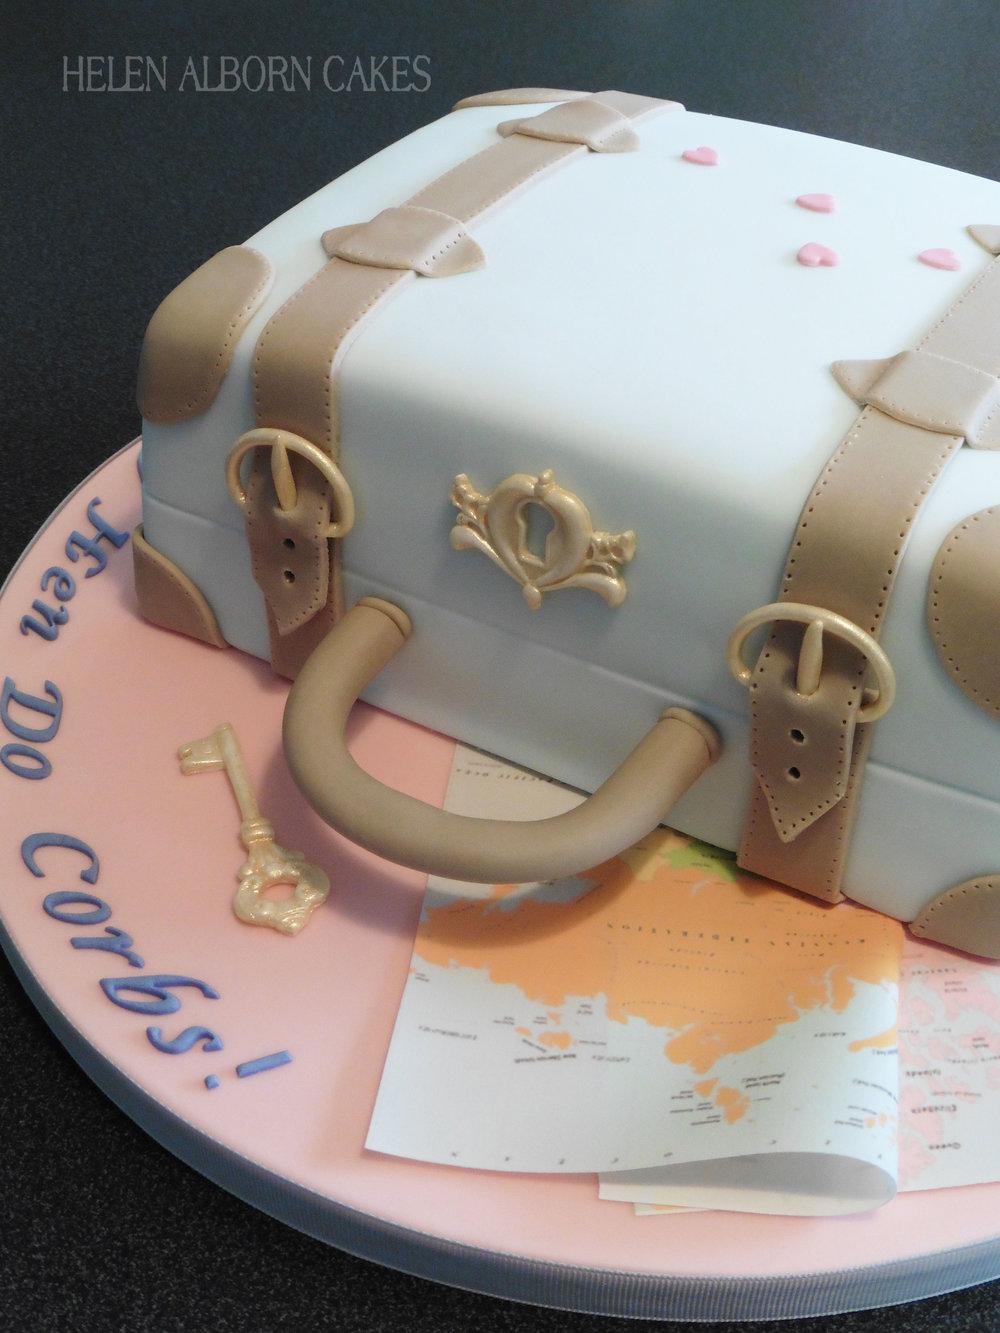 Suitcase cake copy 3.jpg